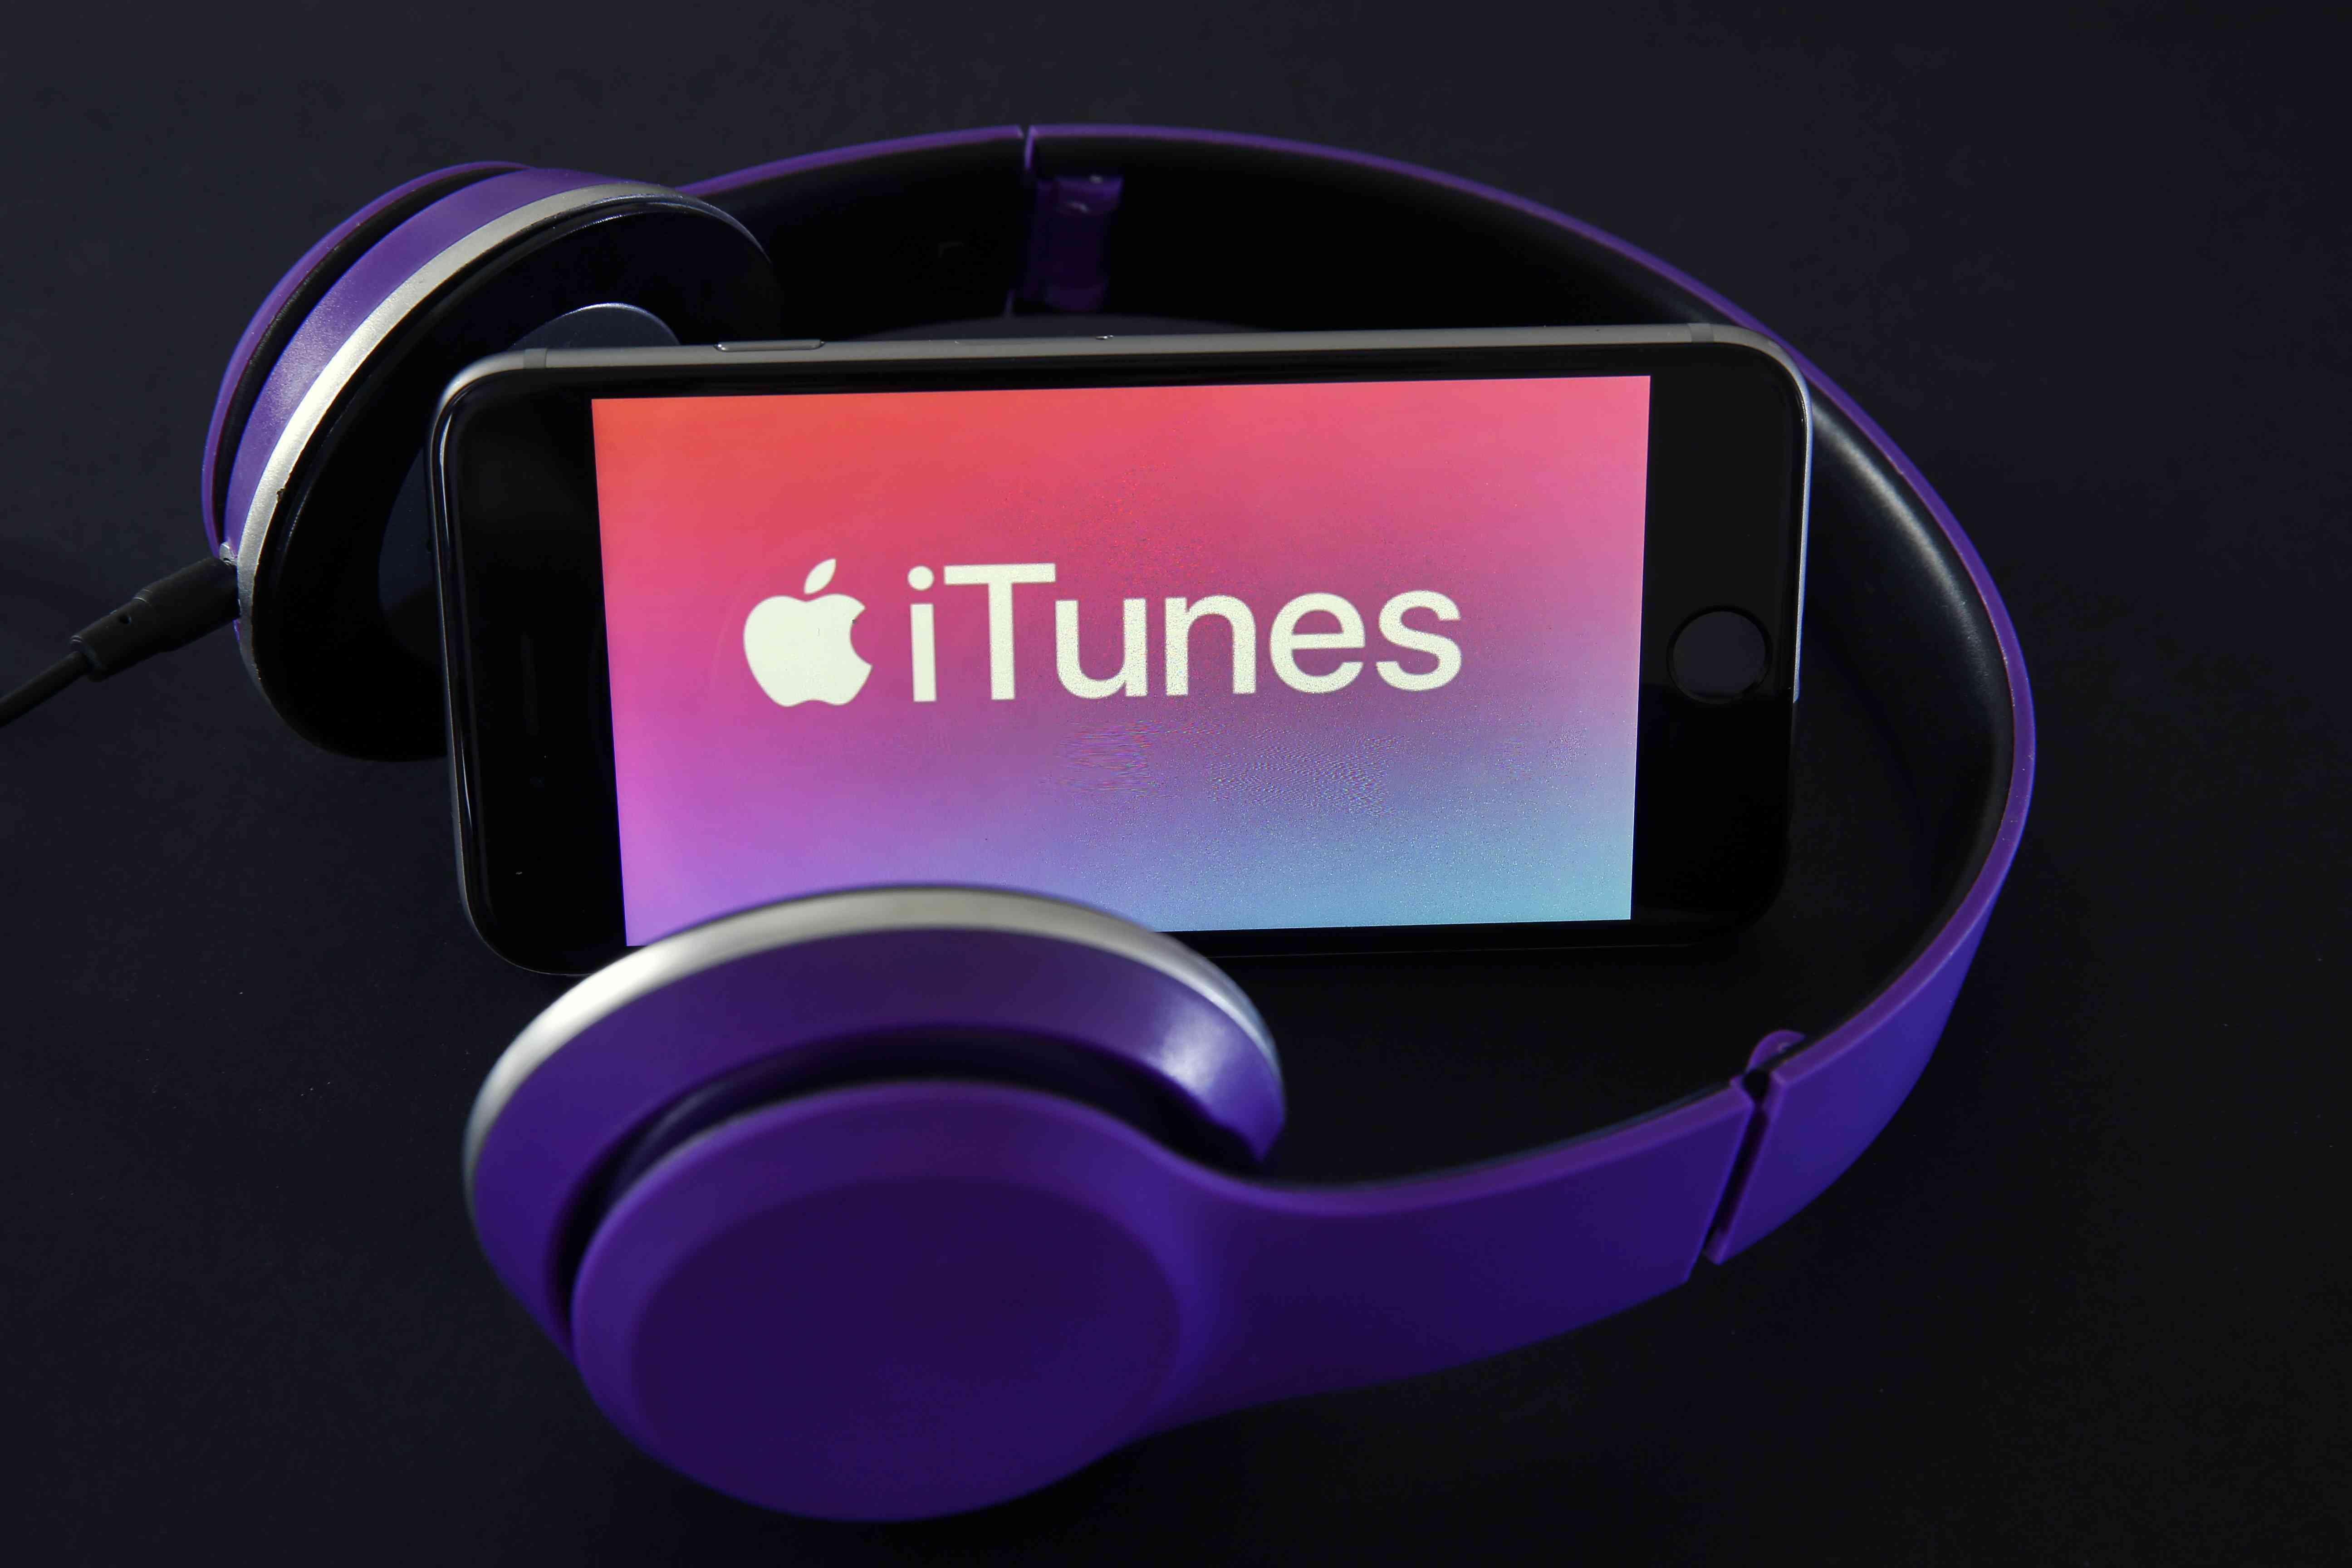 Headphones surrounding iPhone showing iTunes music download service logo on screen